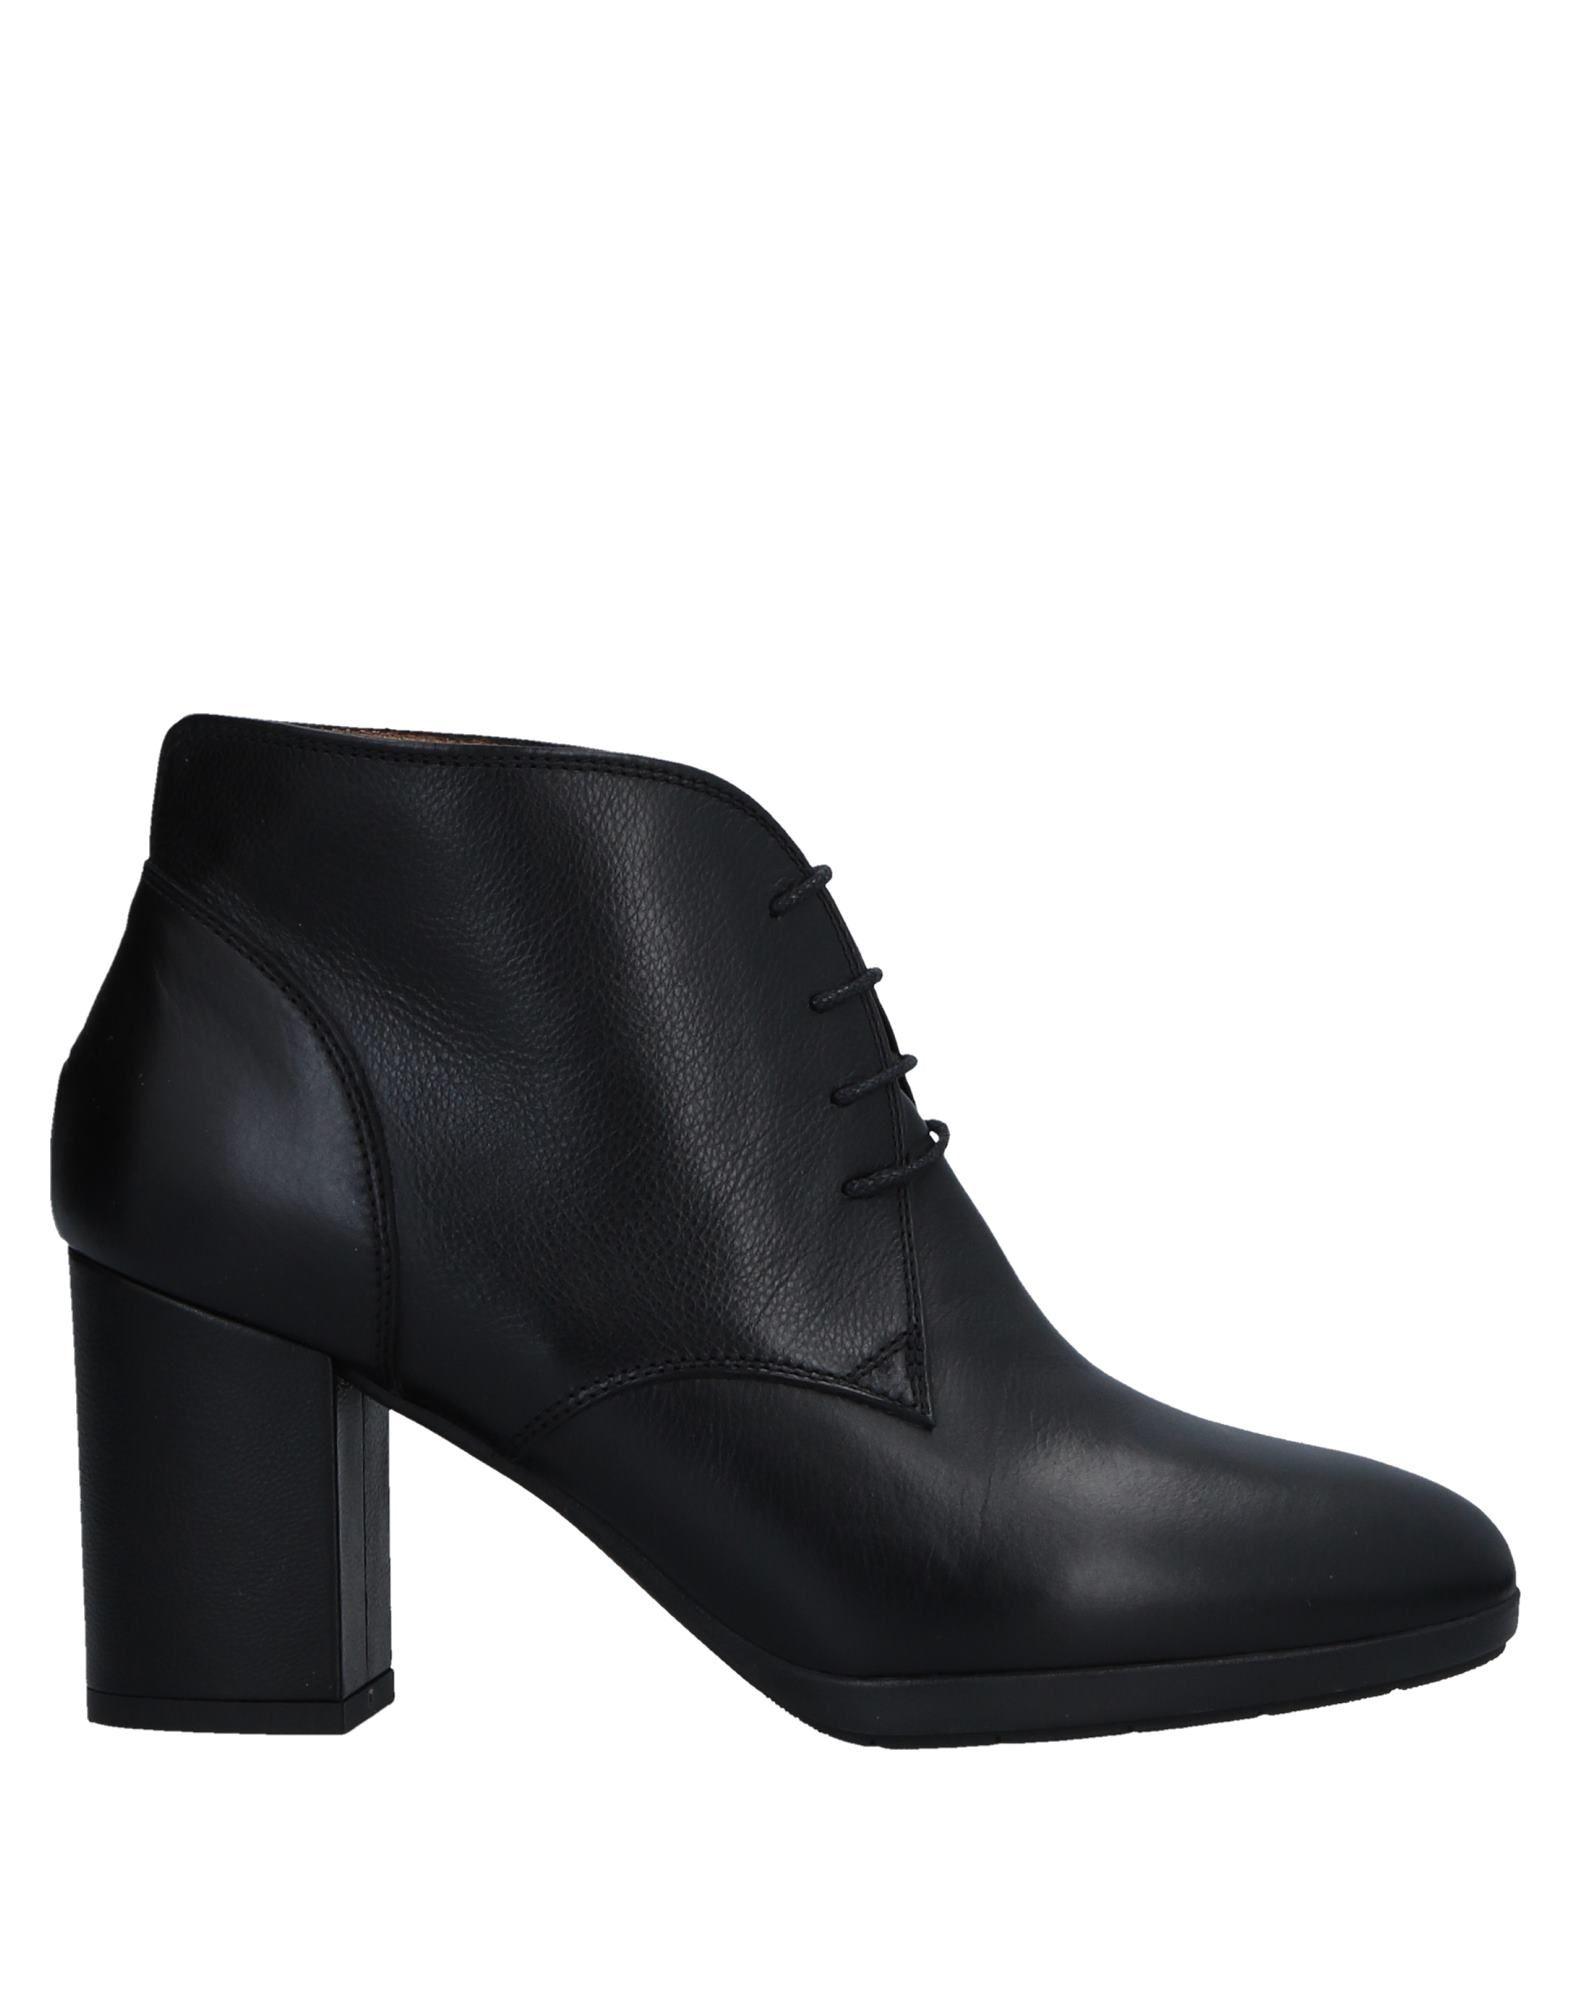 Rabatt Schuhe F.Lli Bruglia Stiefelette Damen  11520571OJ